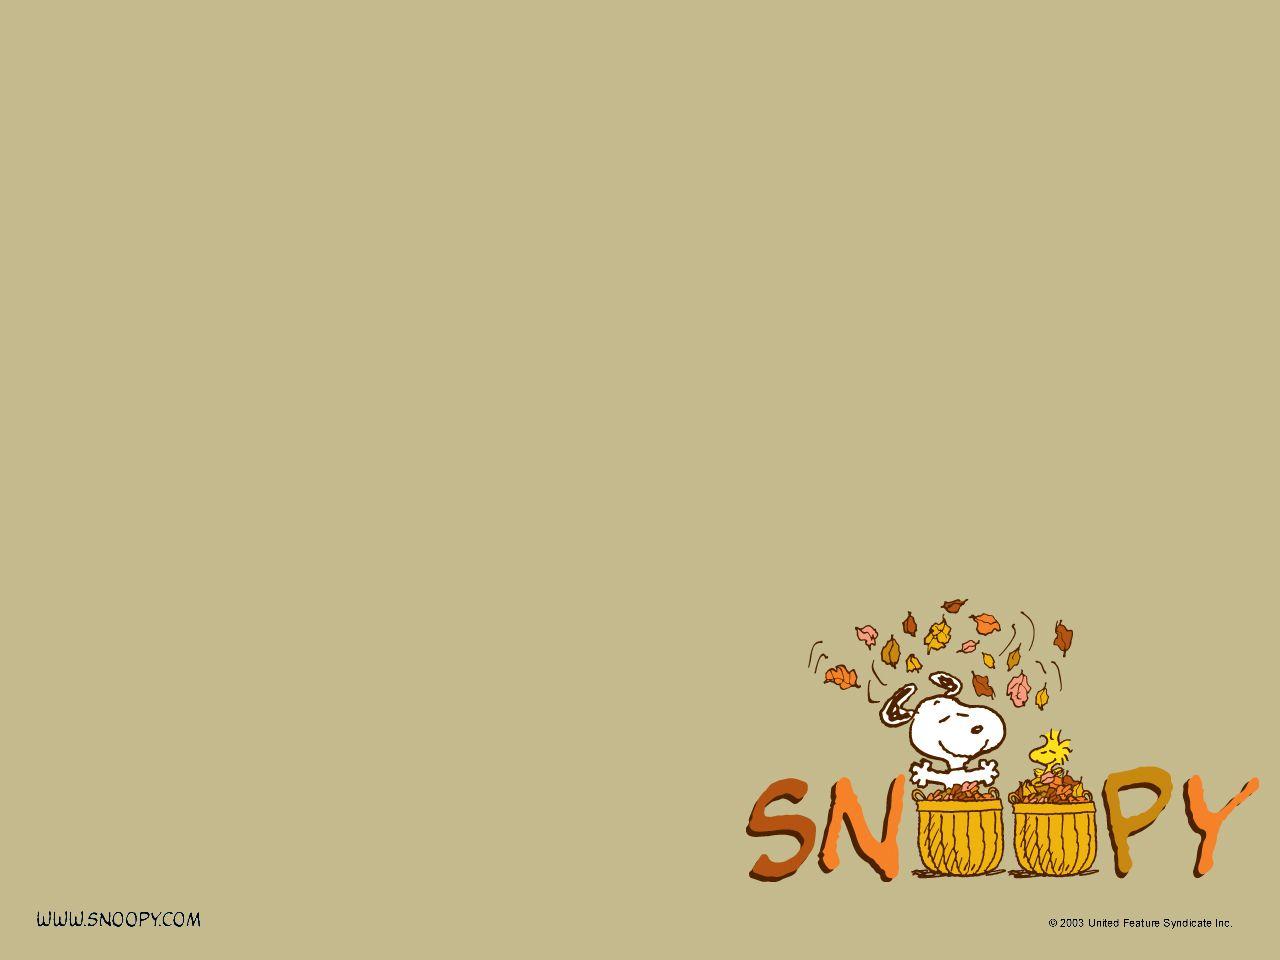 peanuts christmas wallpaper 1080p - photo #16